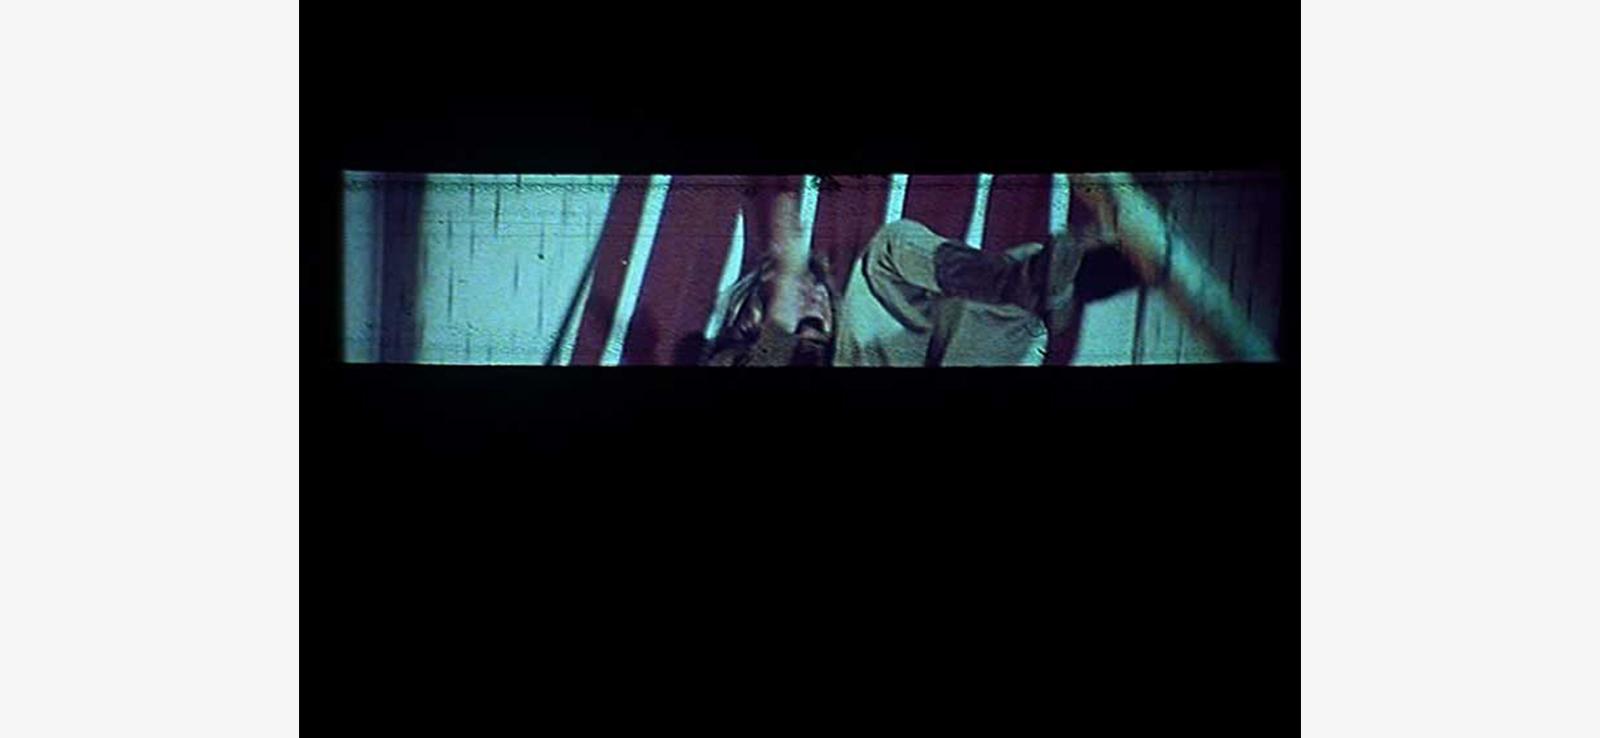 Antoni-Pinent-FILM-QUARTET-POLYFRAME-experimental-filmmaker